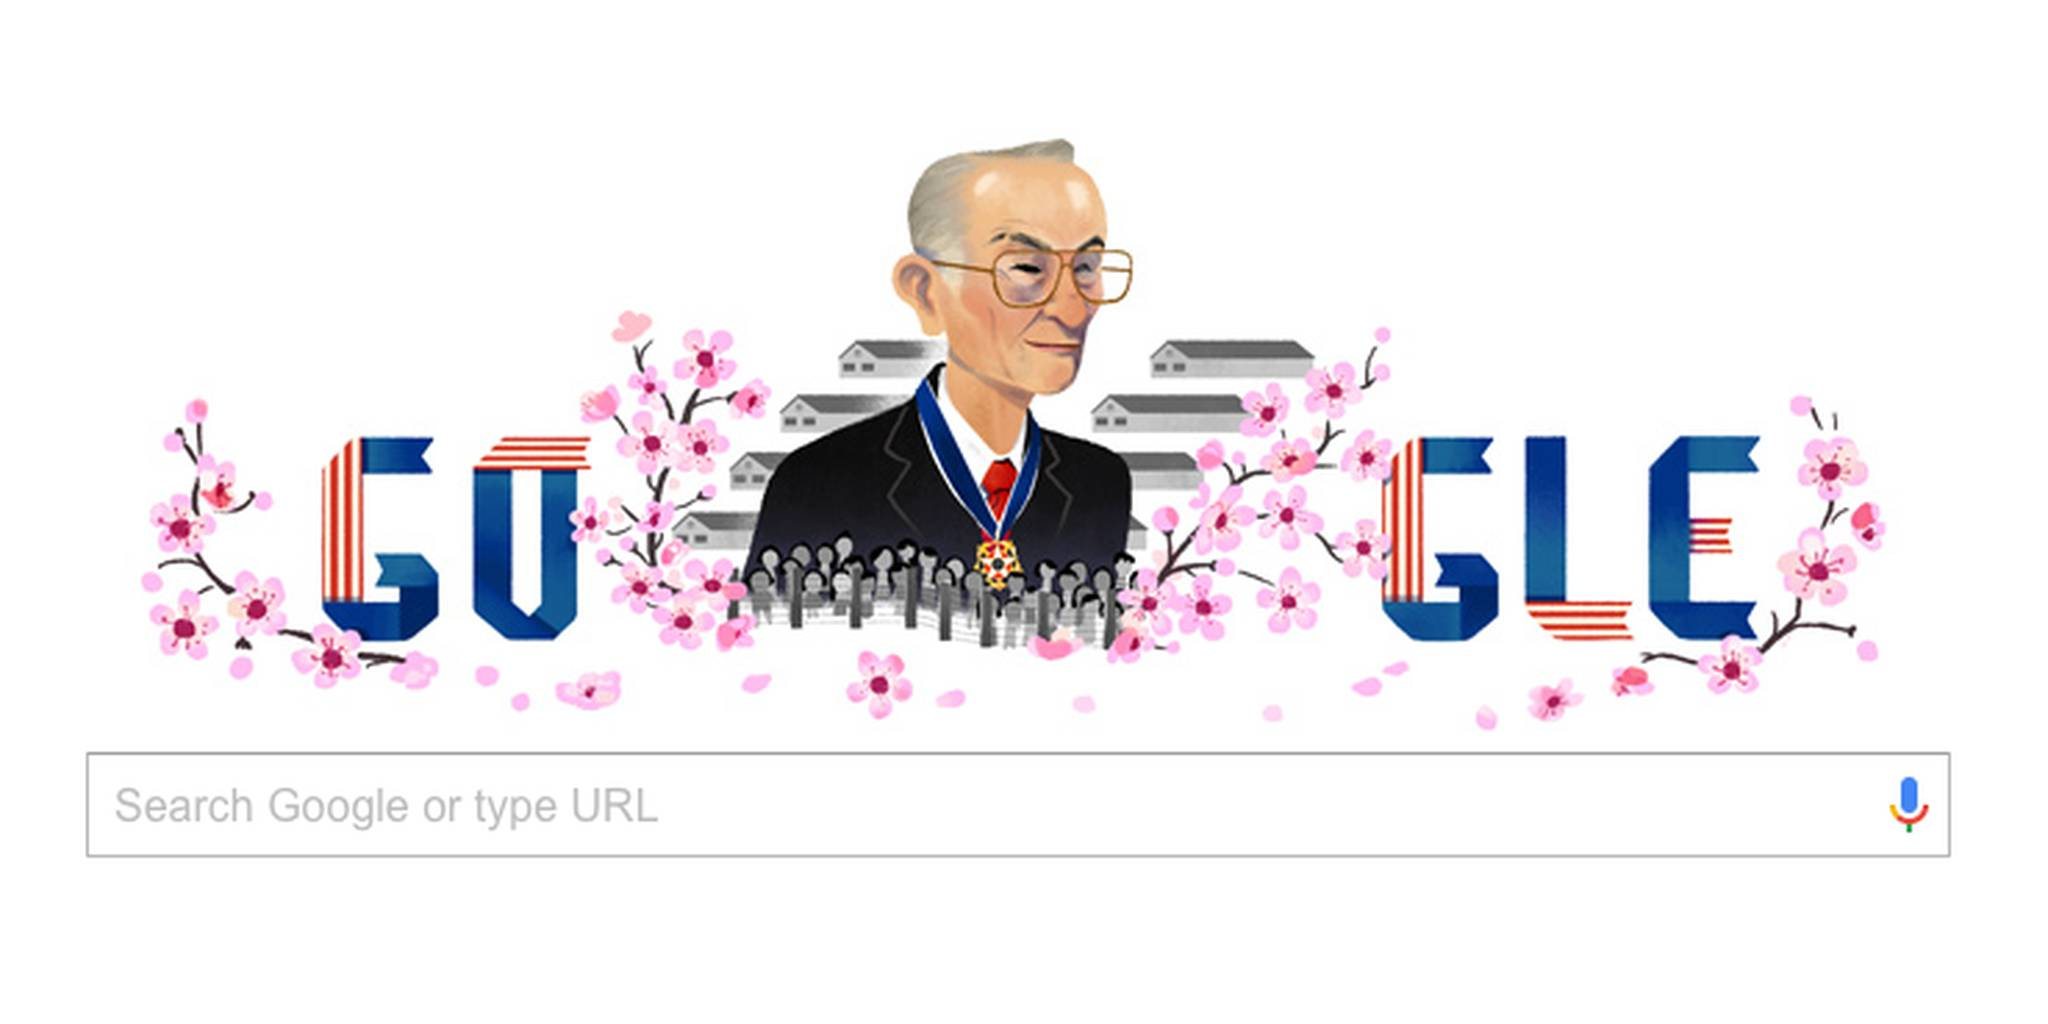 Google Doodle Celebrates Civil Rights Activist Fred Korematsu.